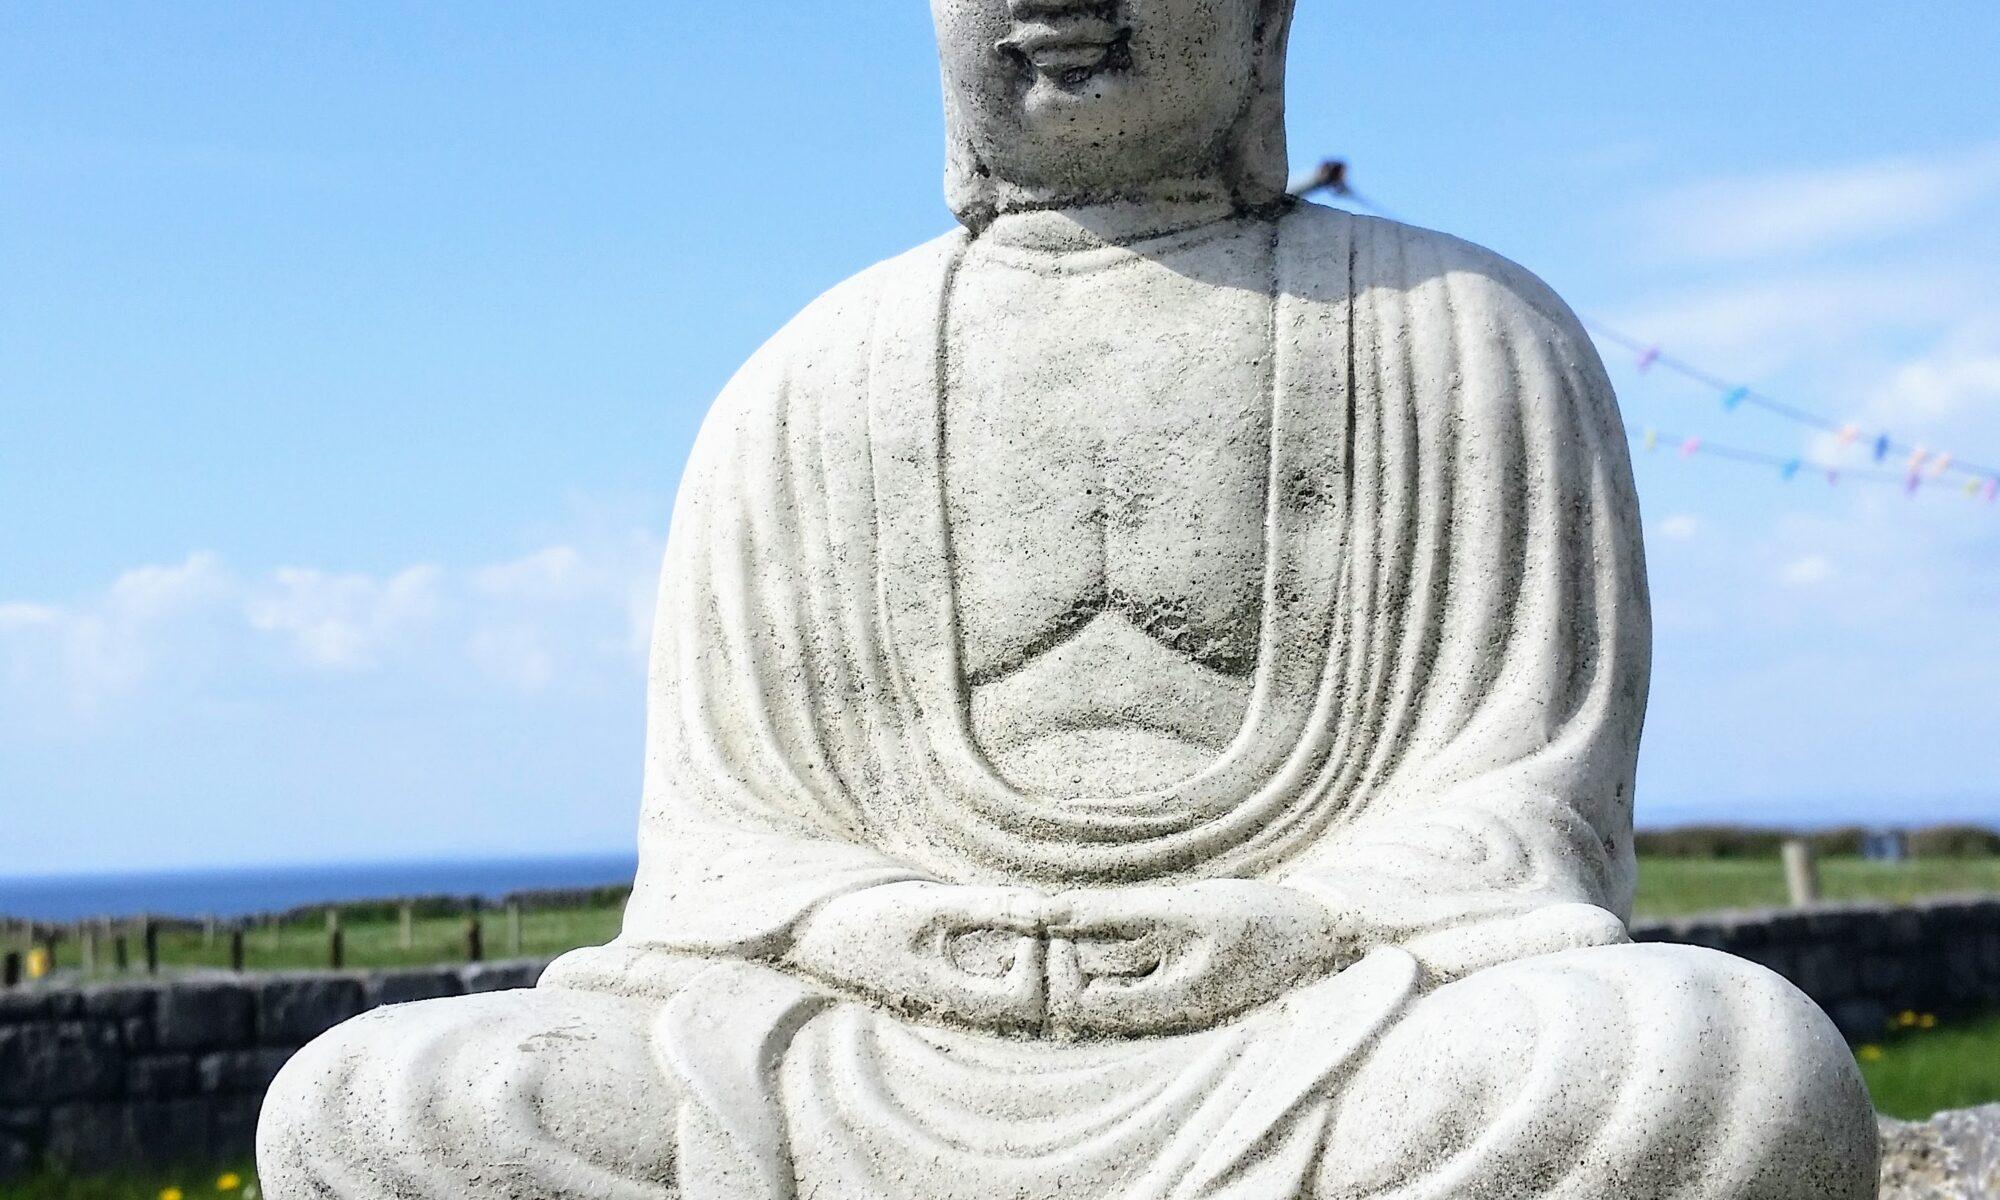 Buddha statue sitting on wall near beach and sea.